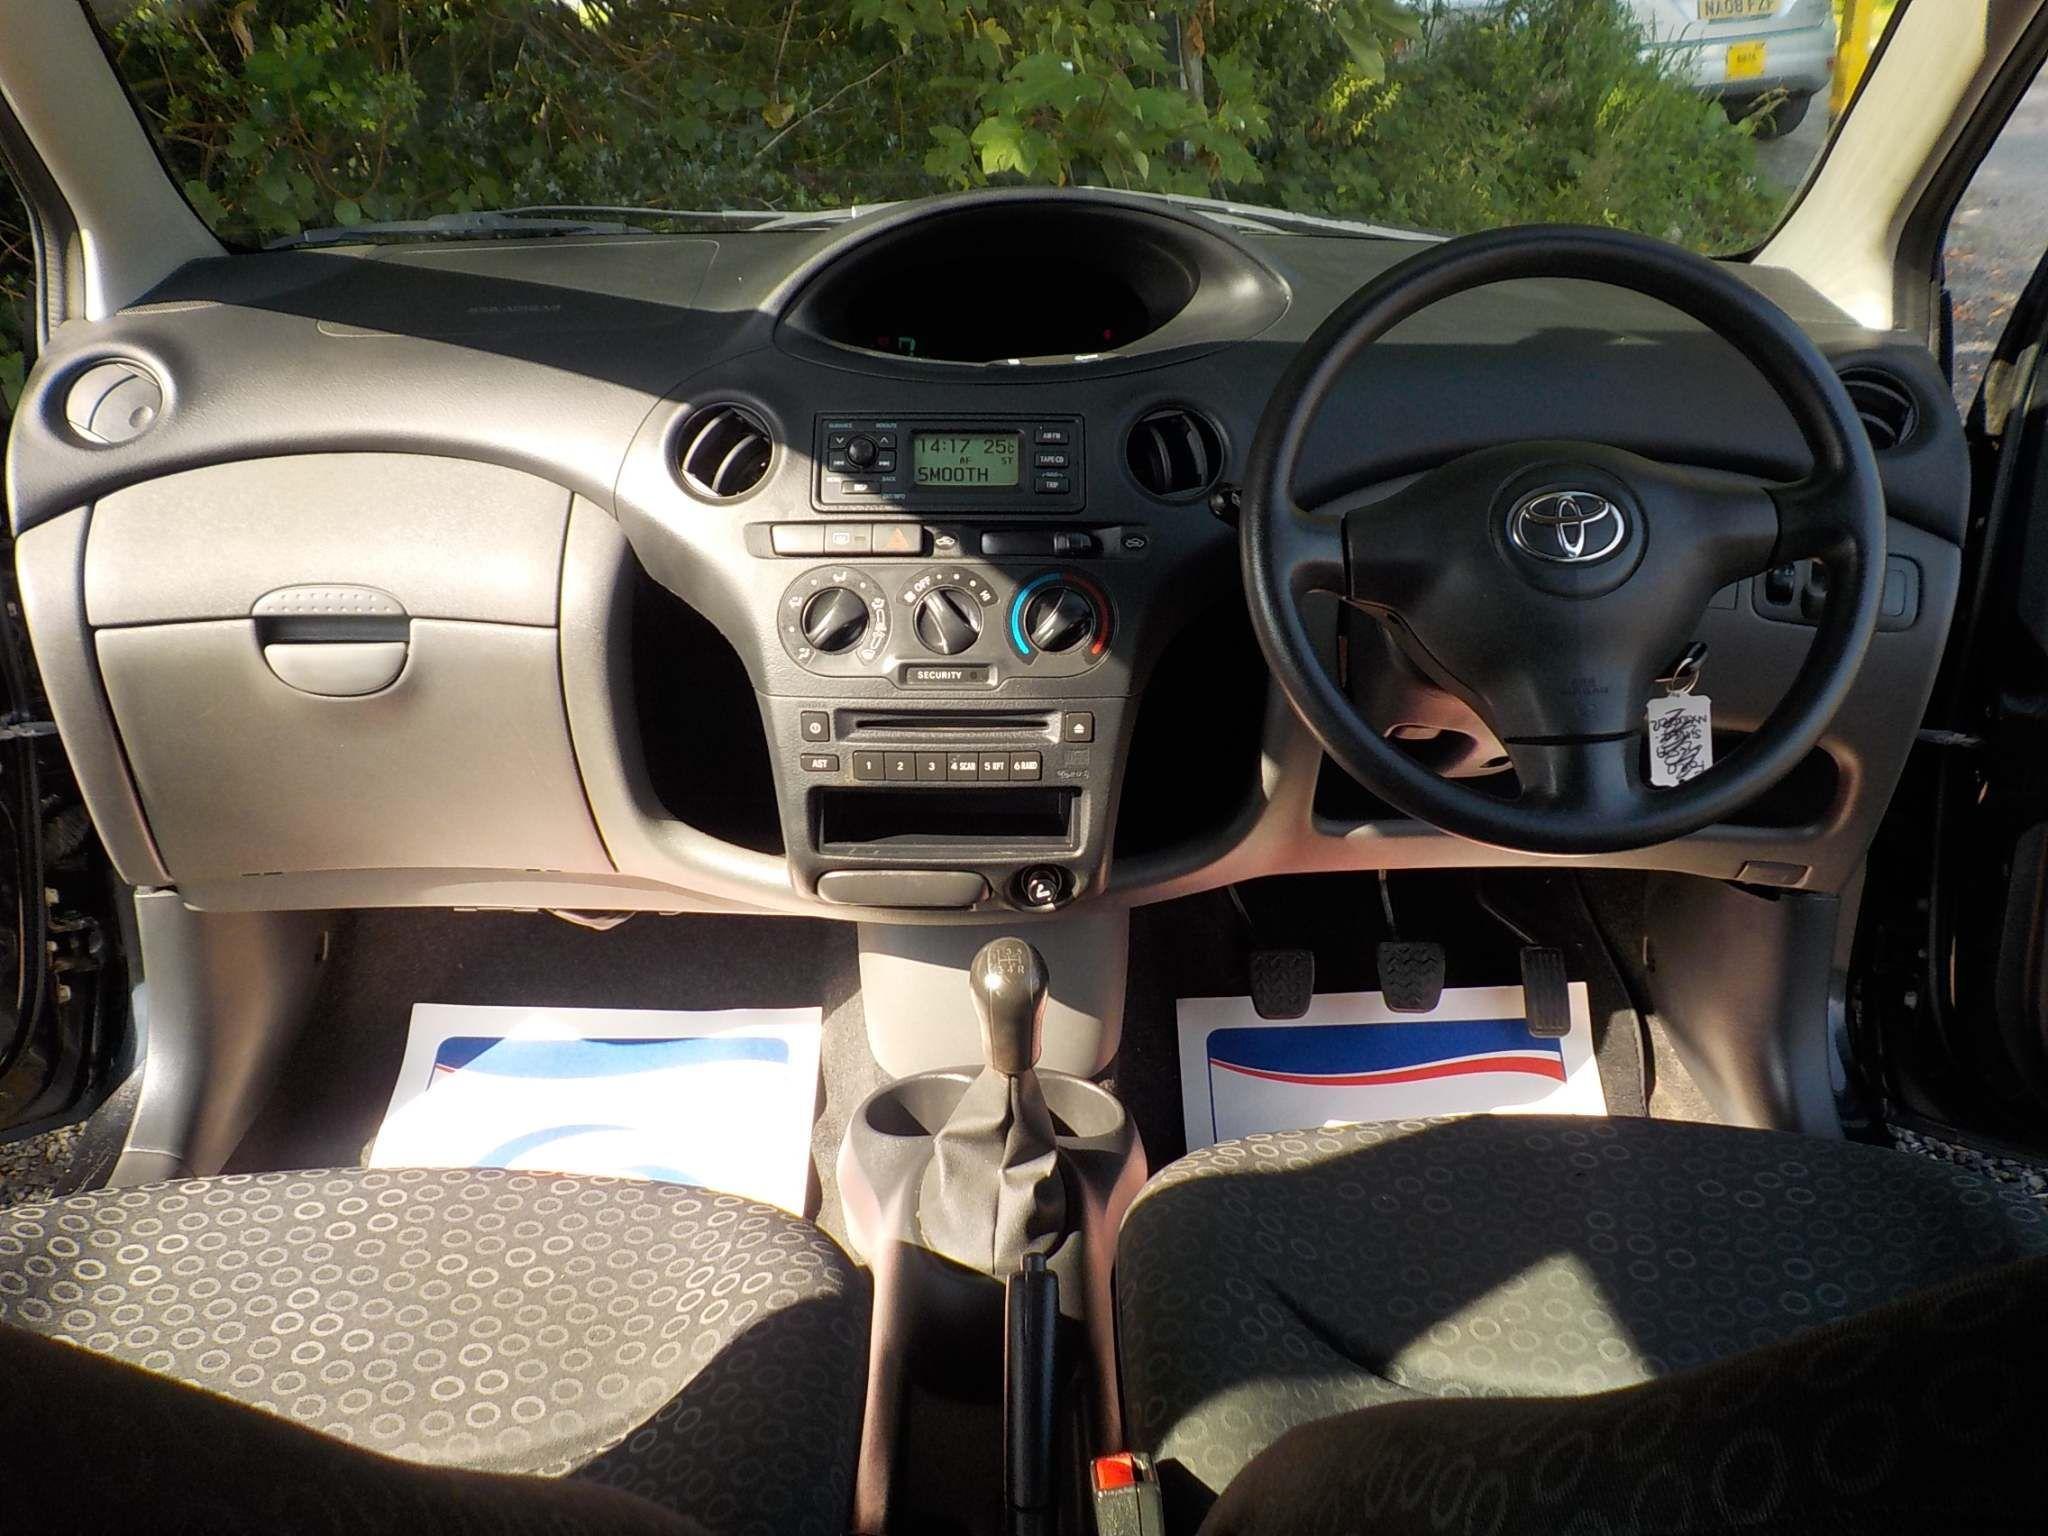 Toyota Yaris 1.0 VVT-i T3 3dr